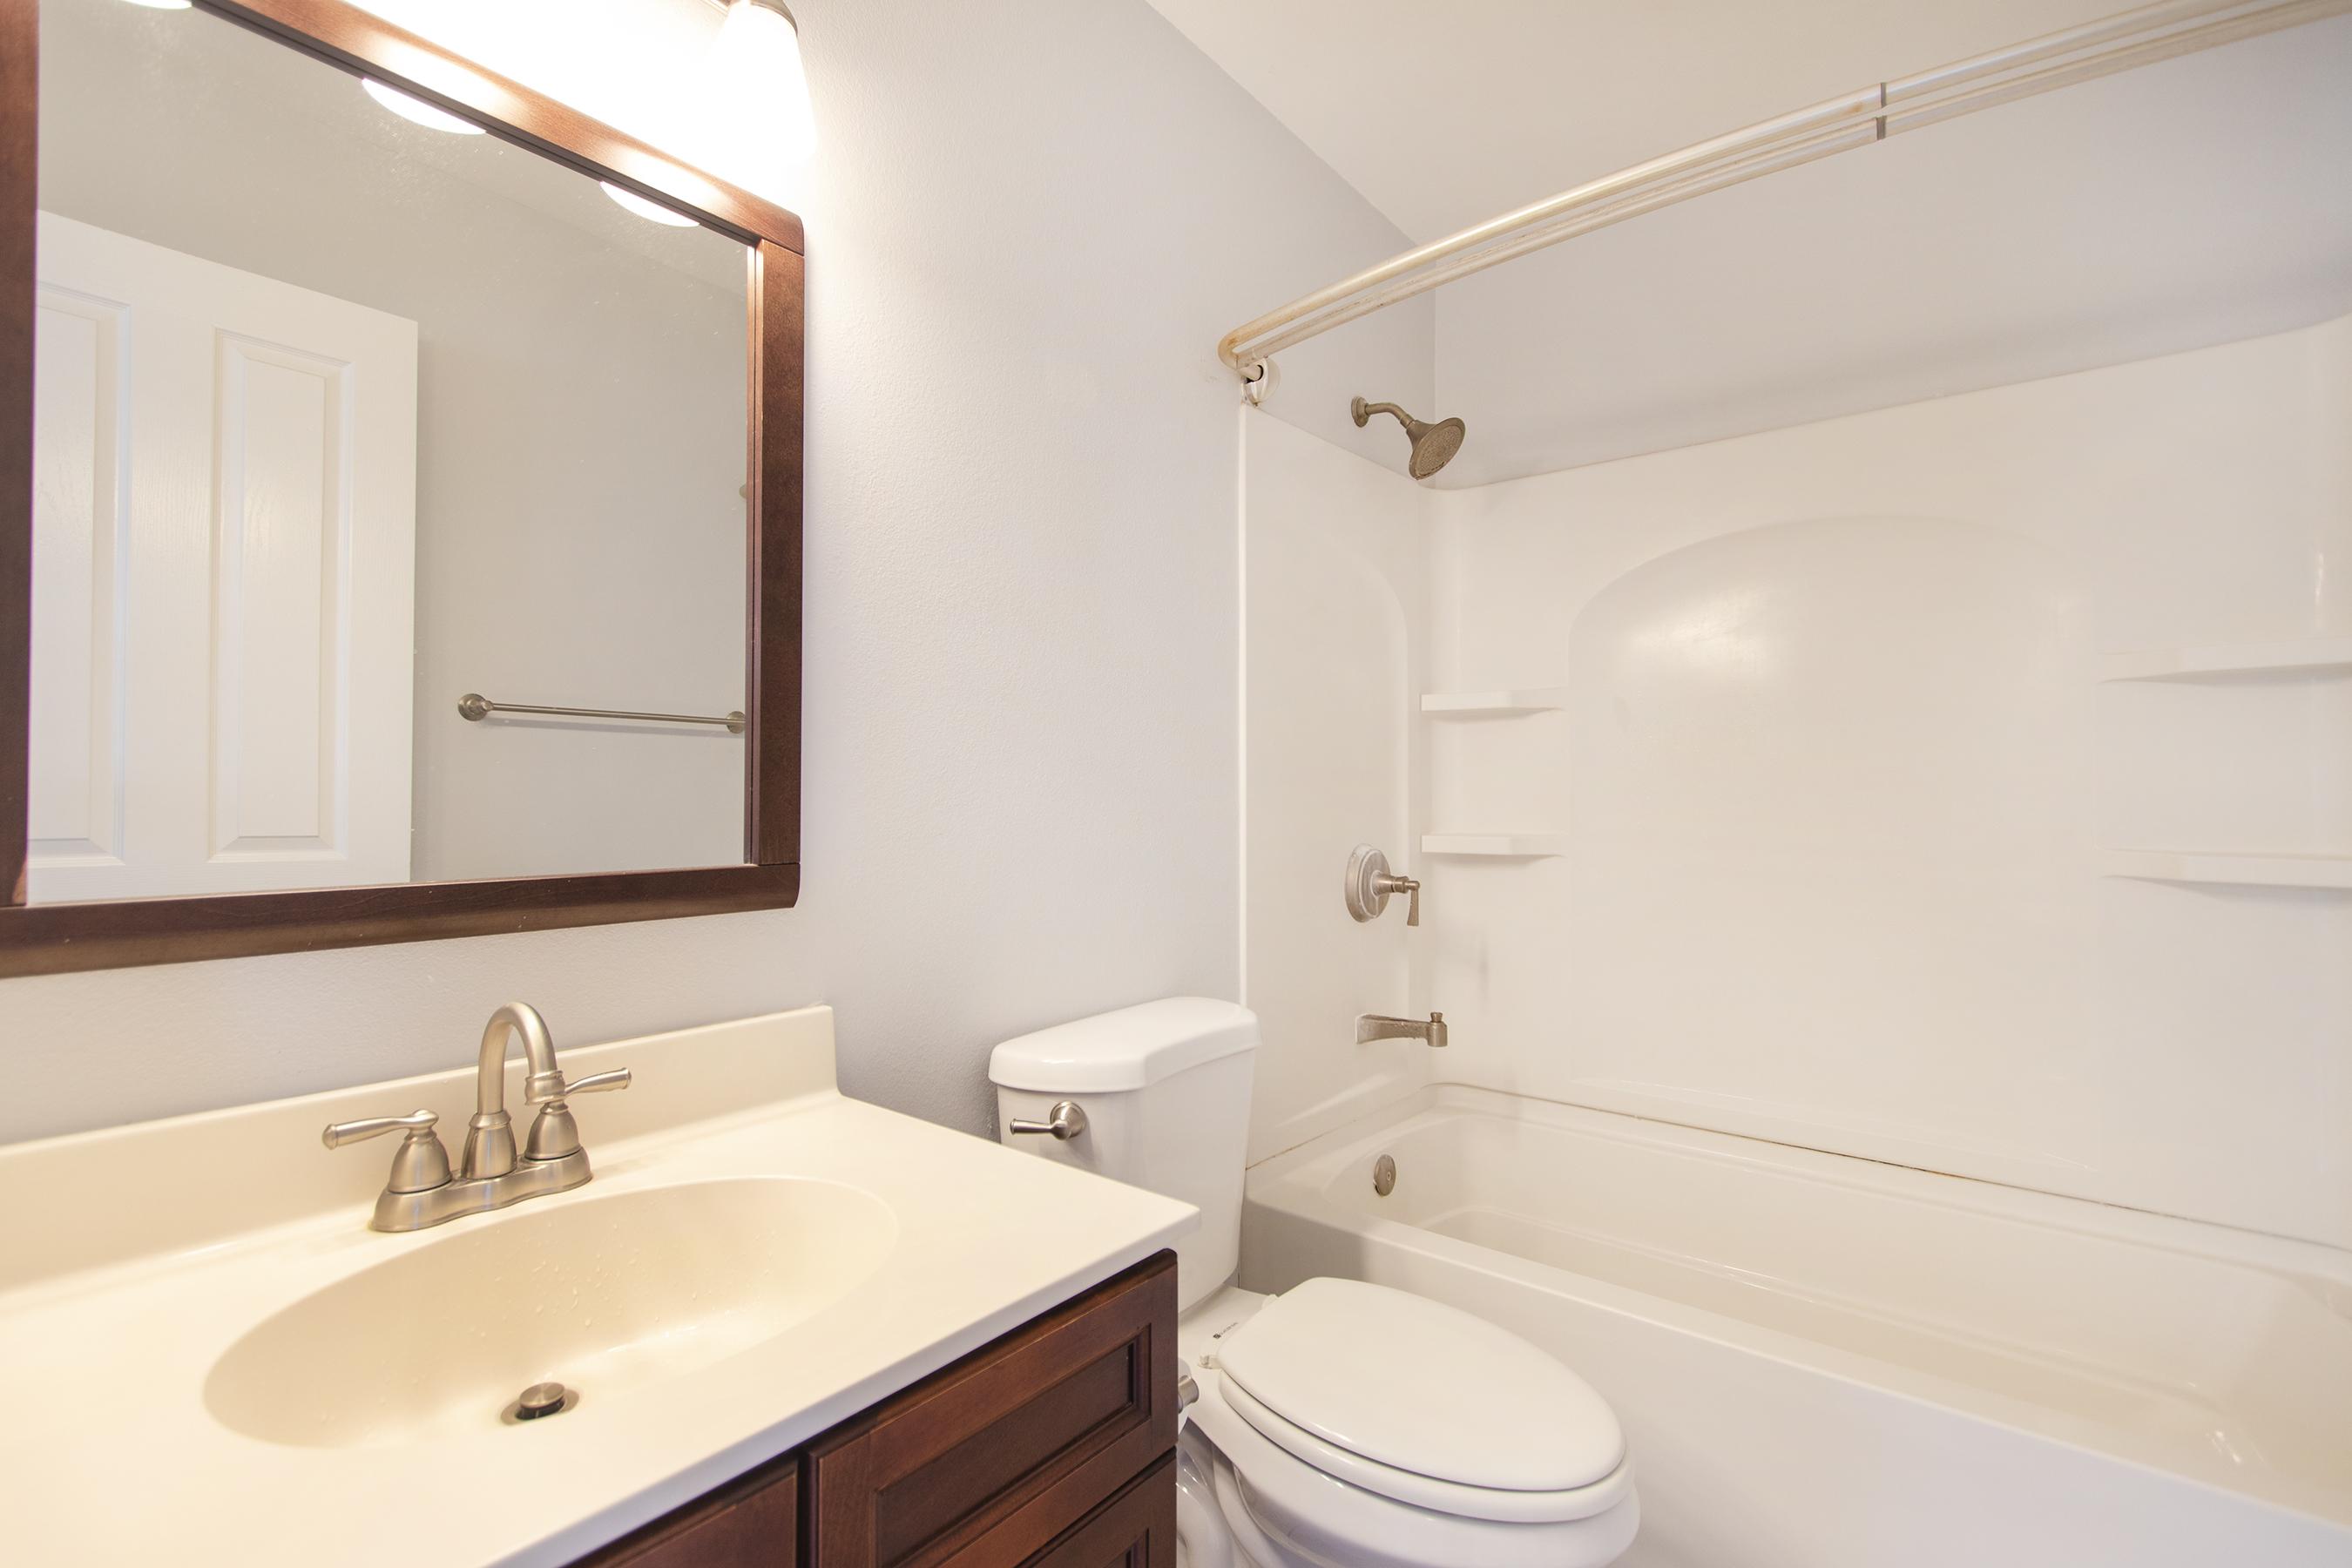 Bathroom 2 at 91-1200 Keaunui Drive #14